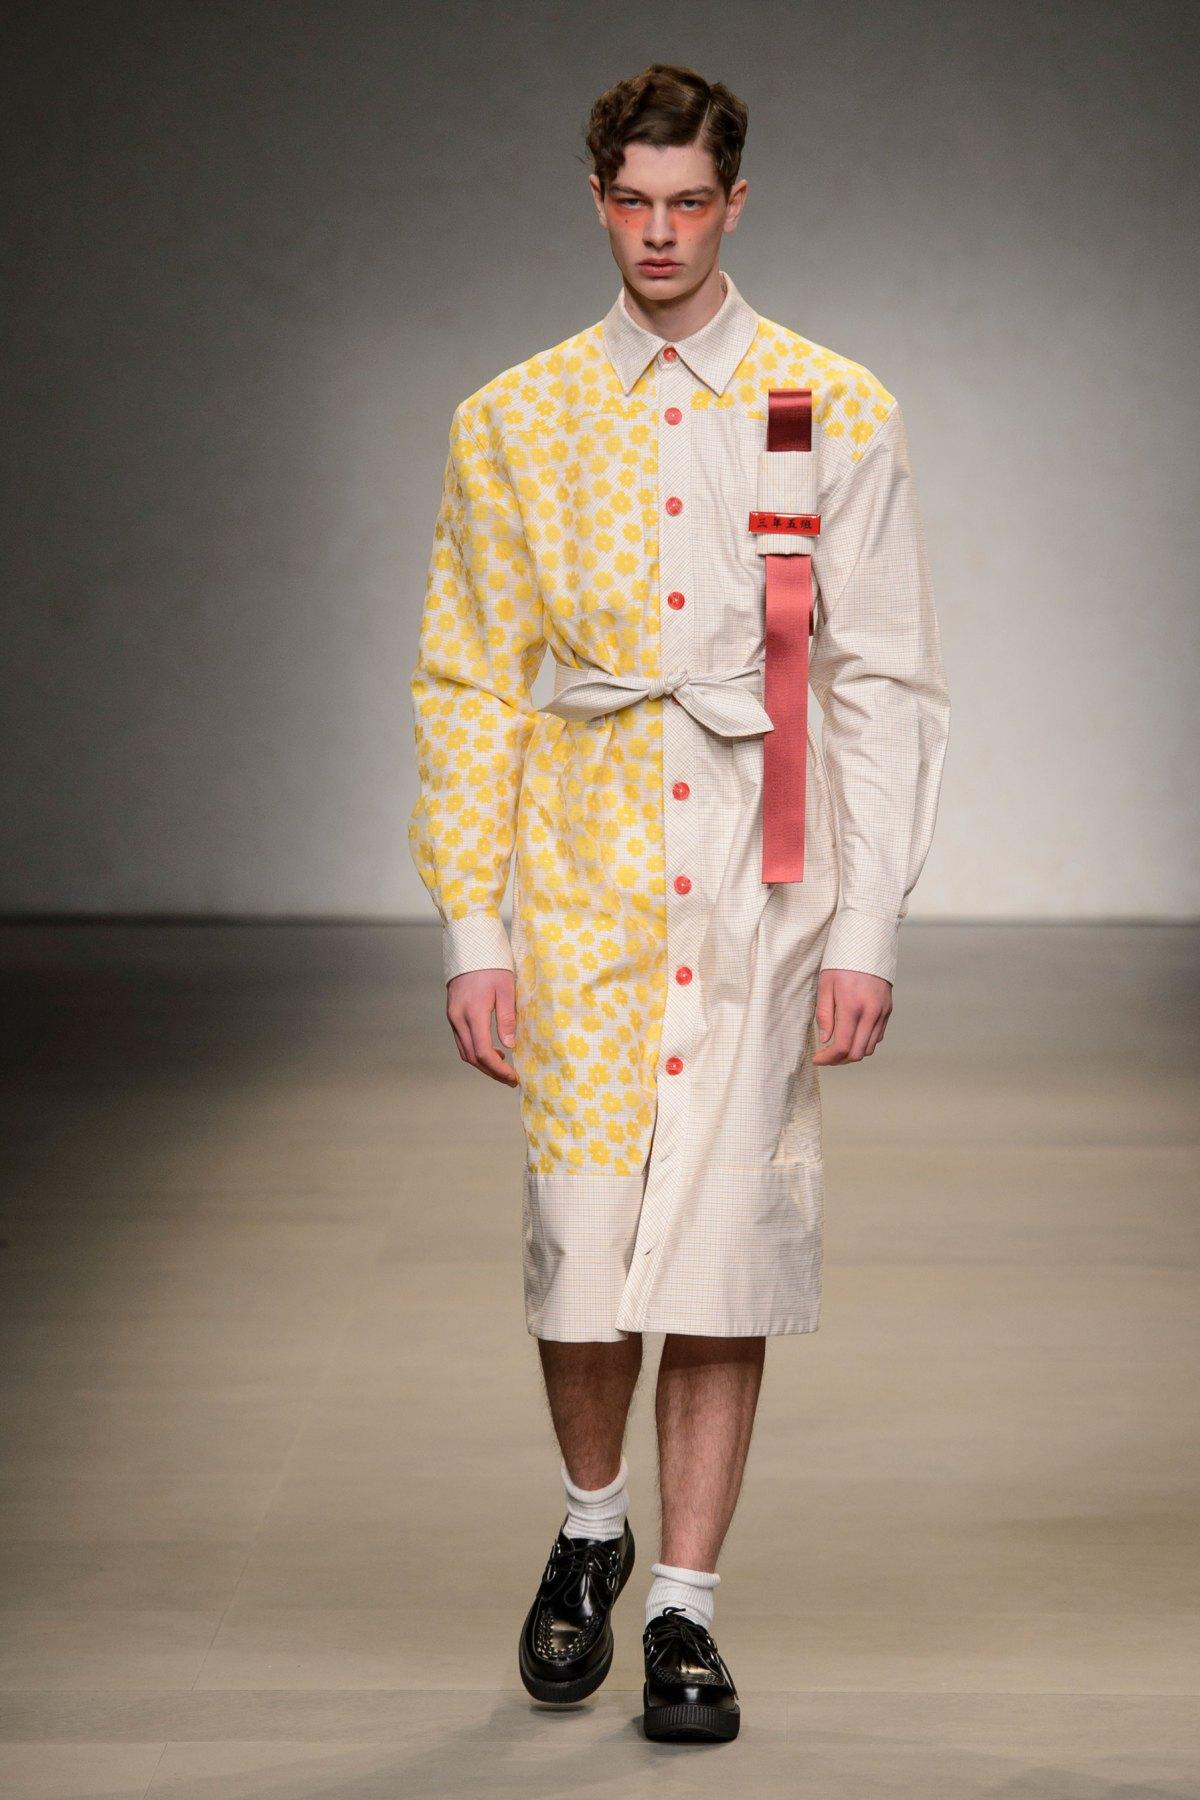 Giovani Designer m RF17 0413